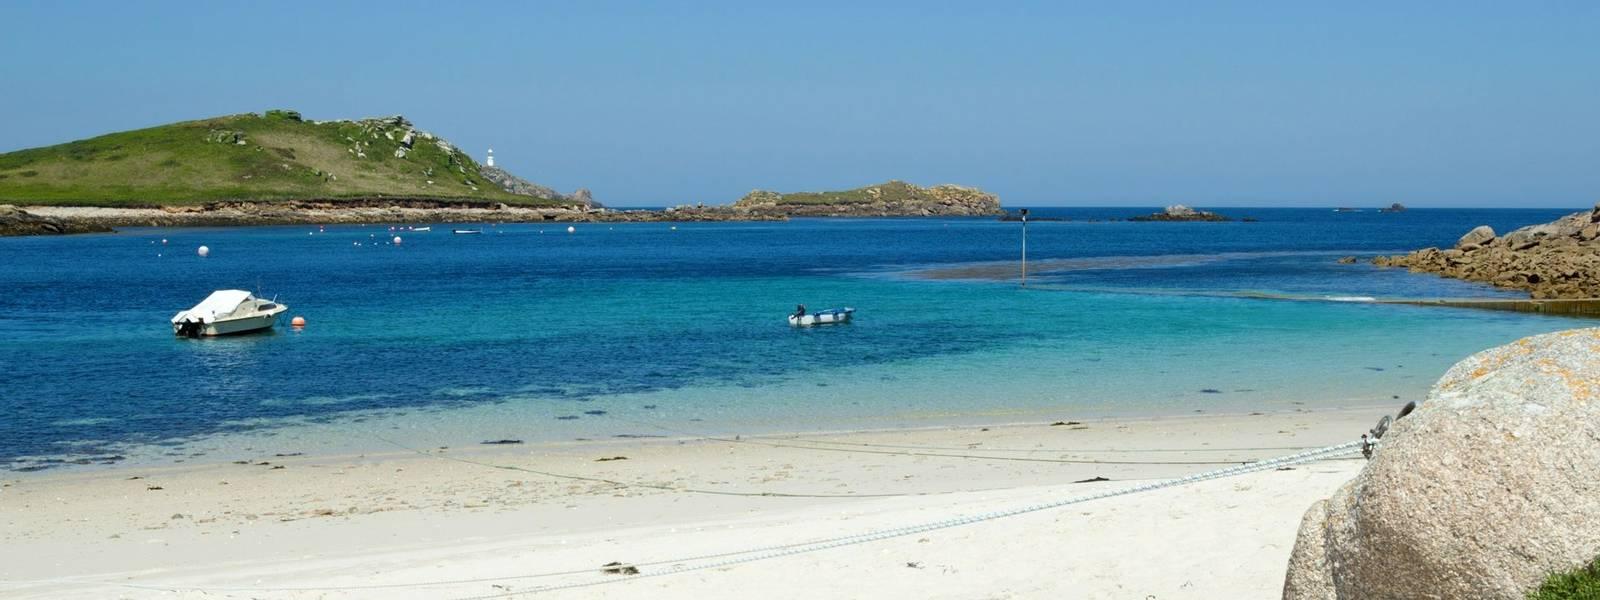 Isles of Scilly - AdobeStock_37563821.jpeg